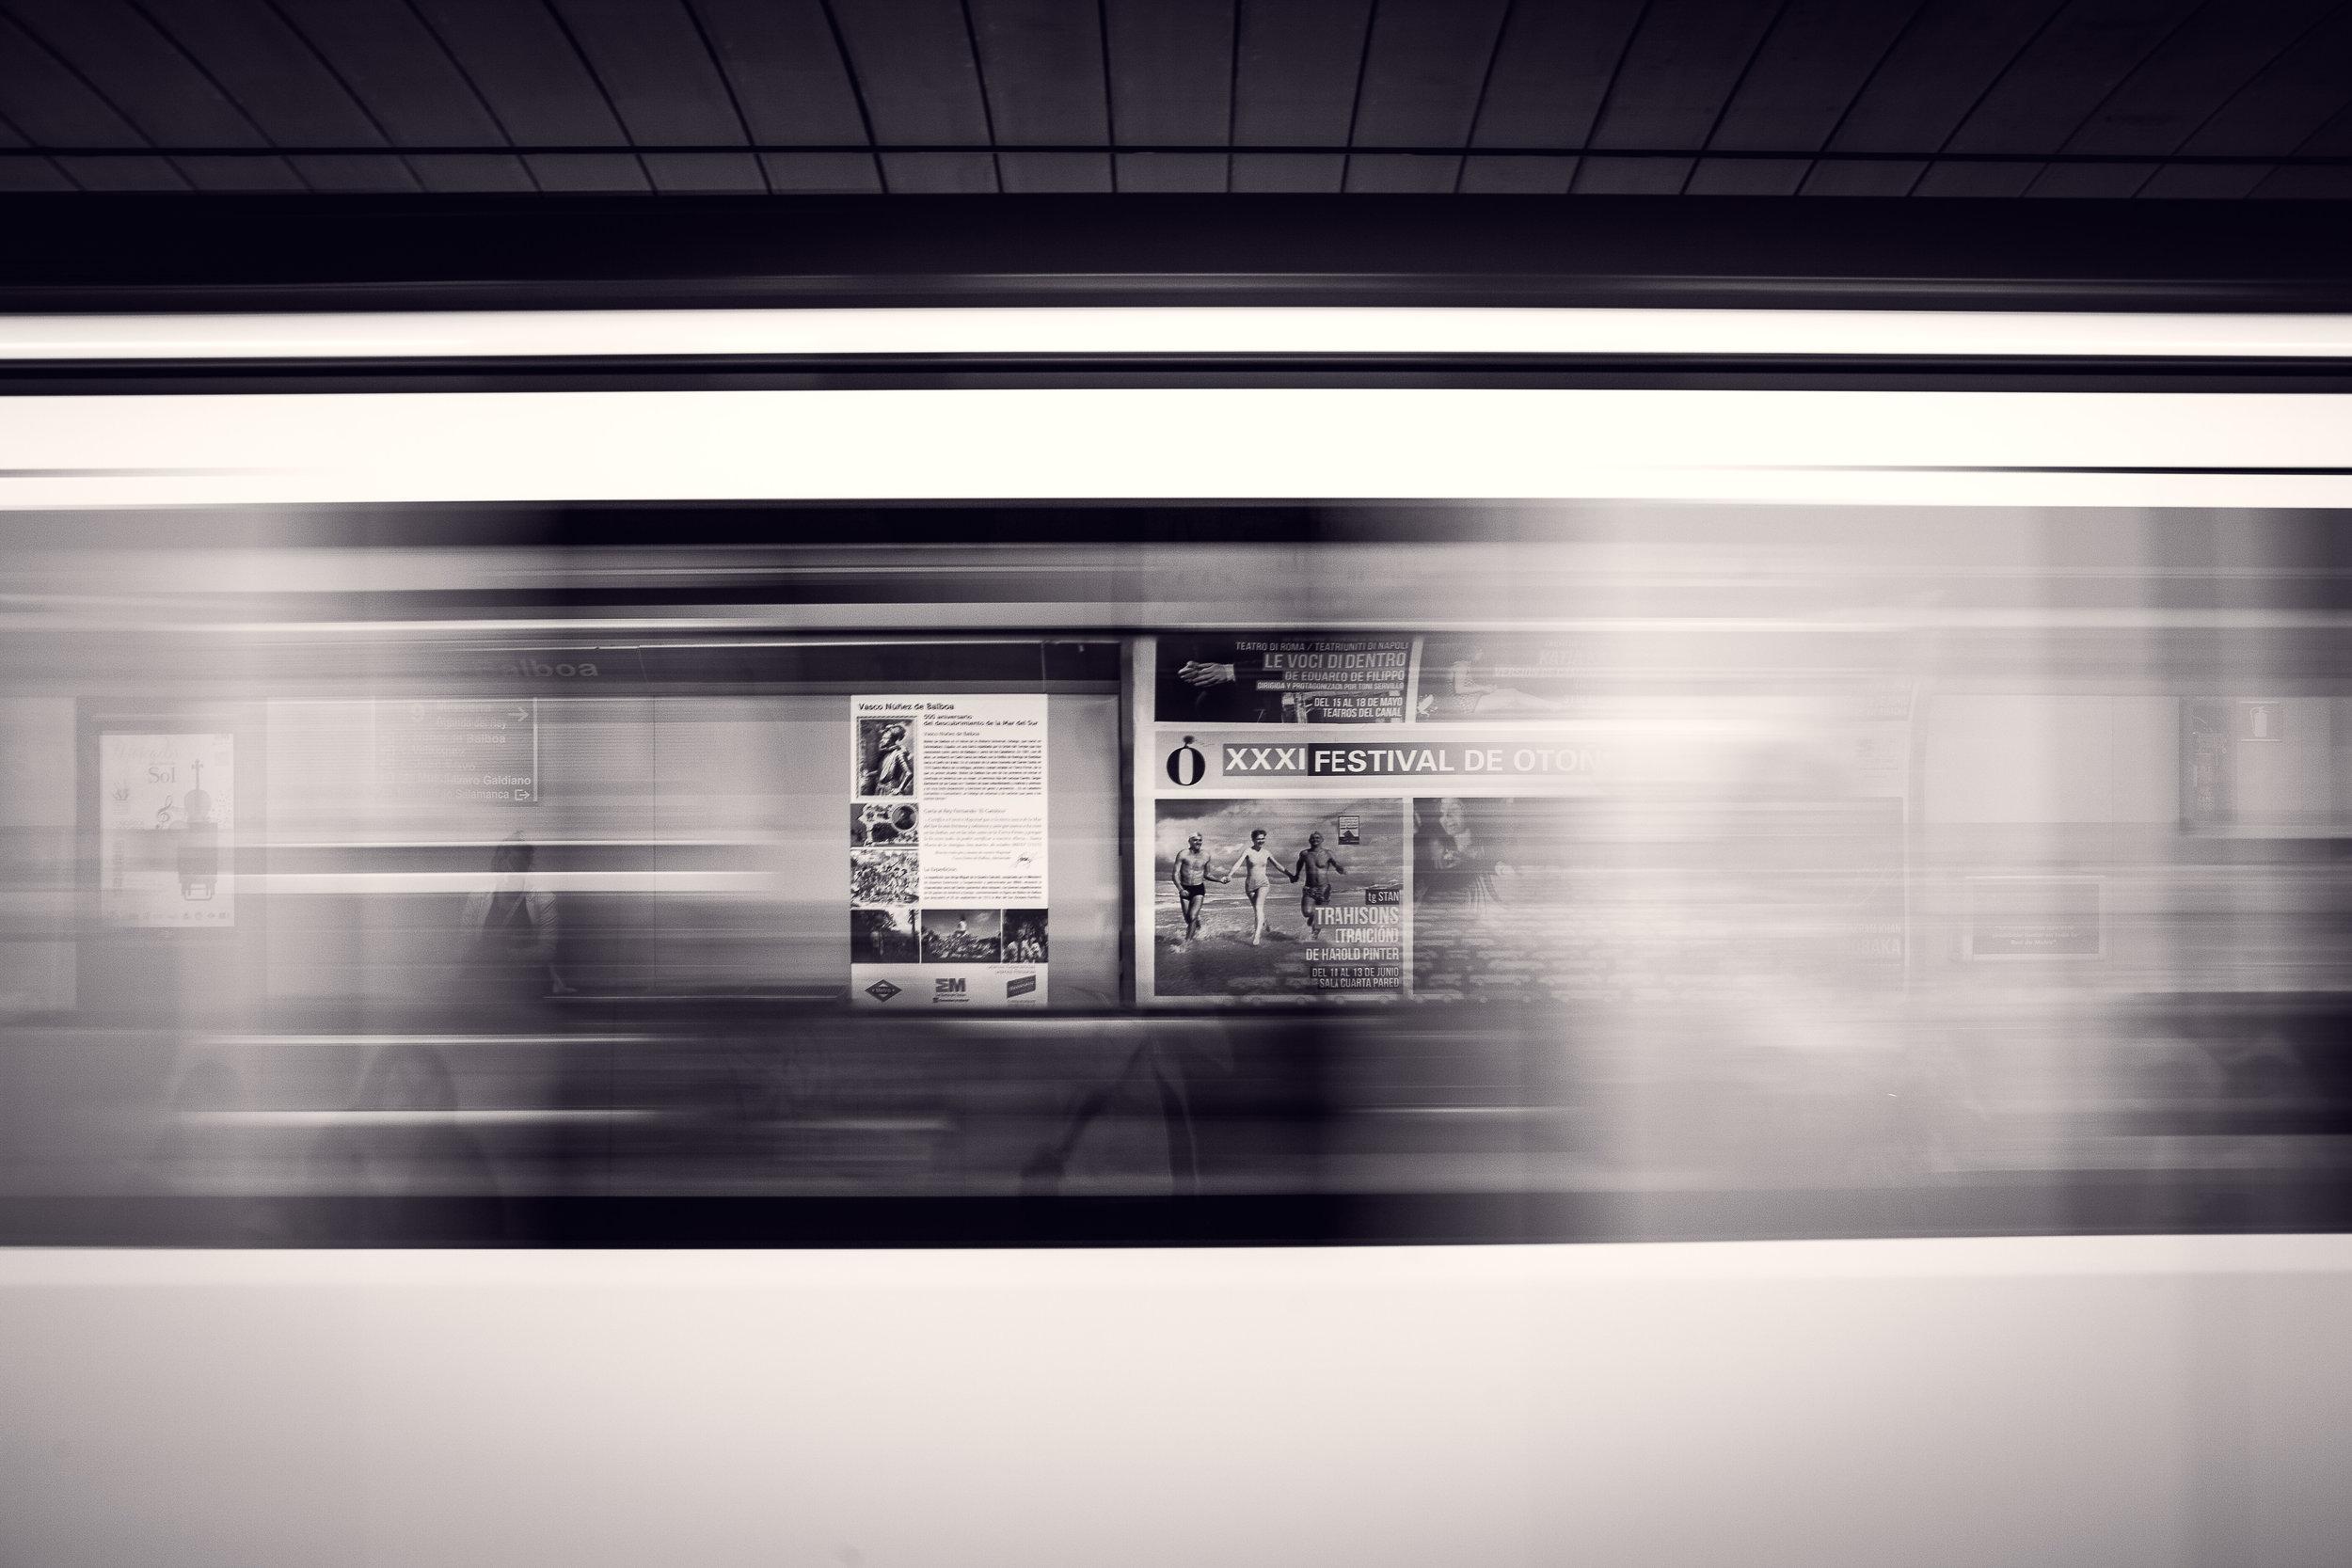 blur subway.jpg